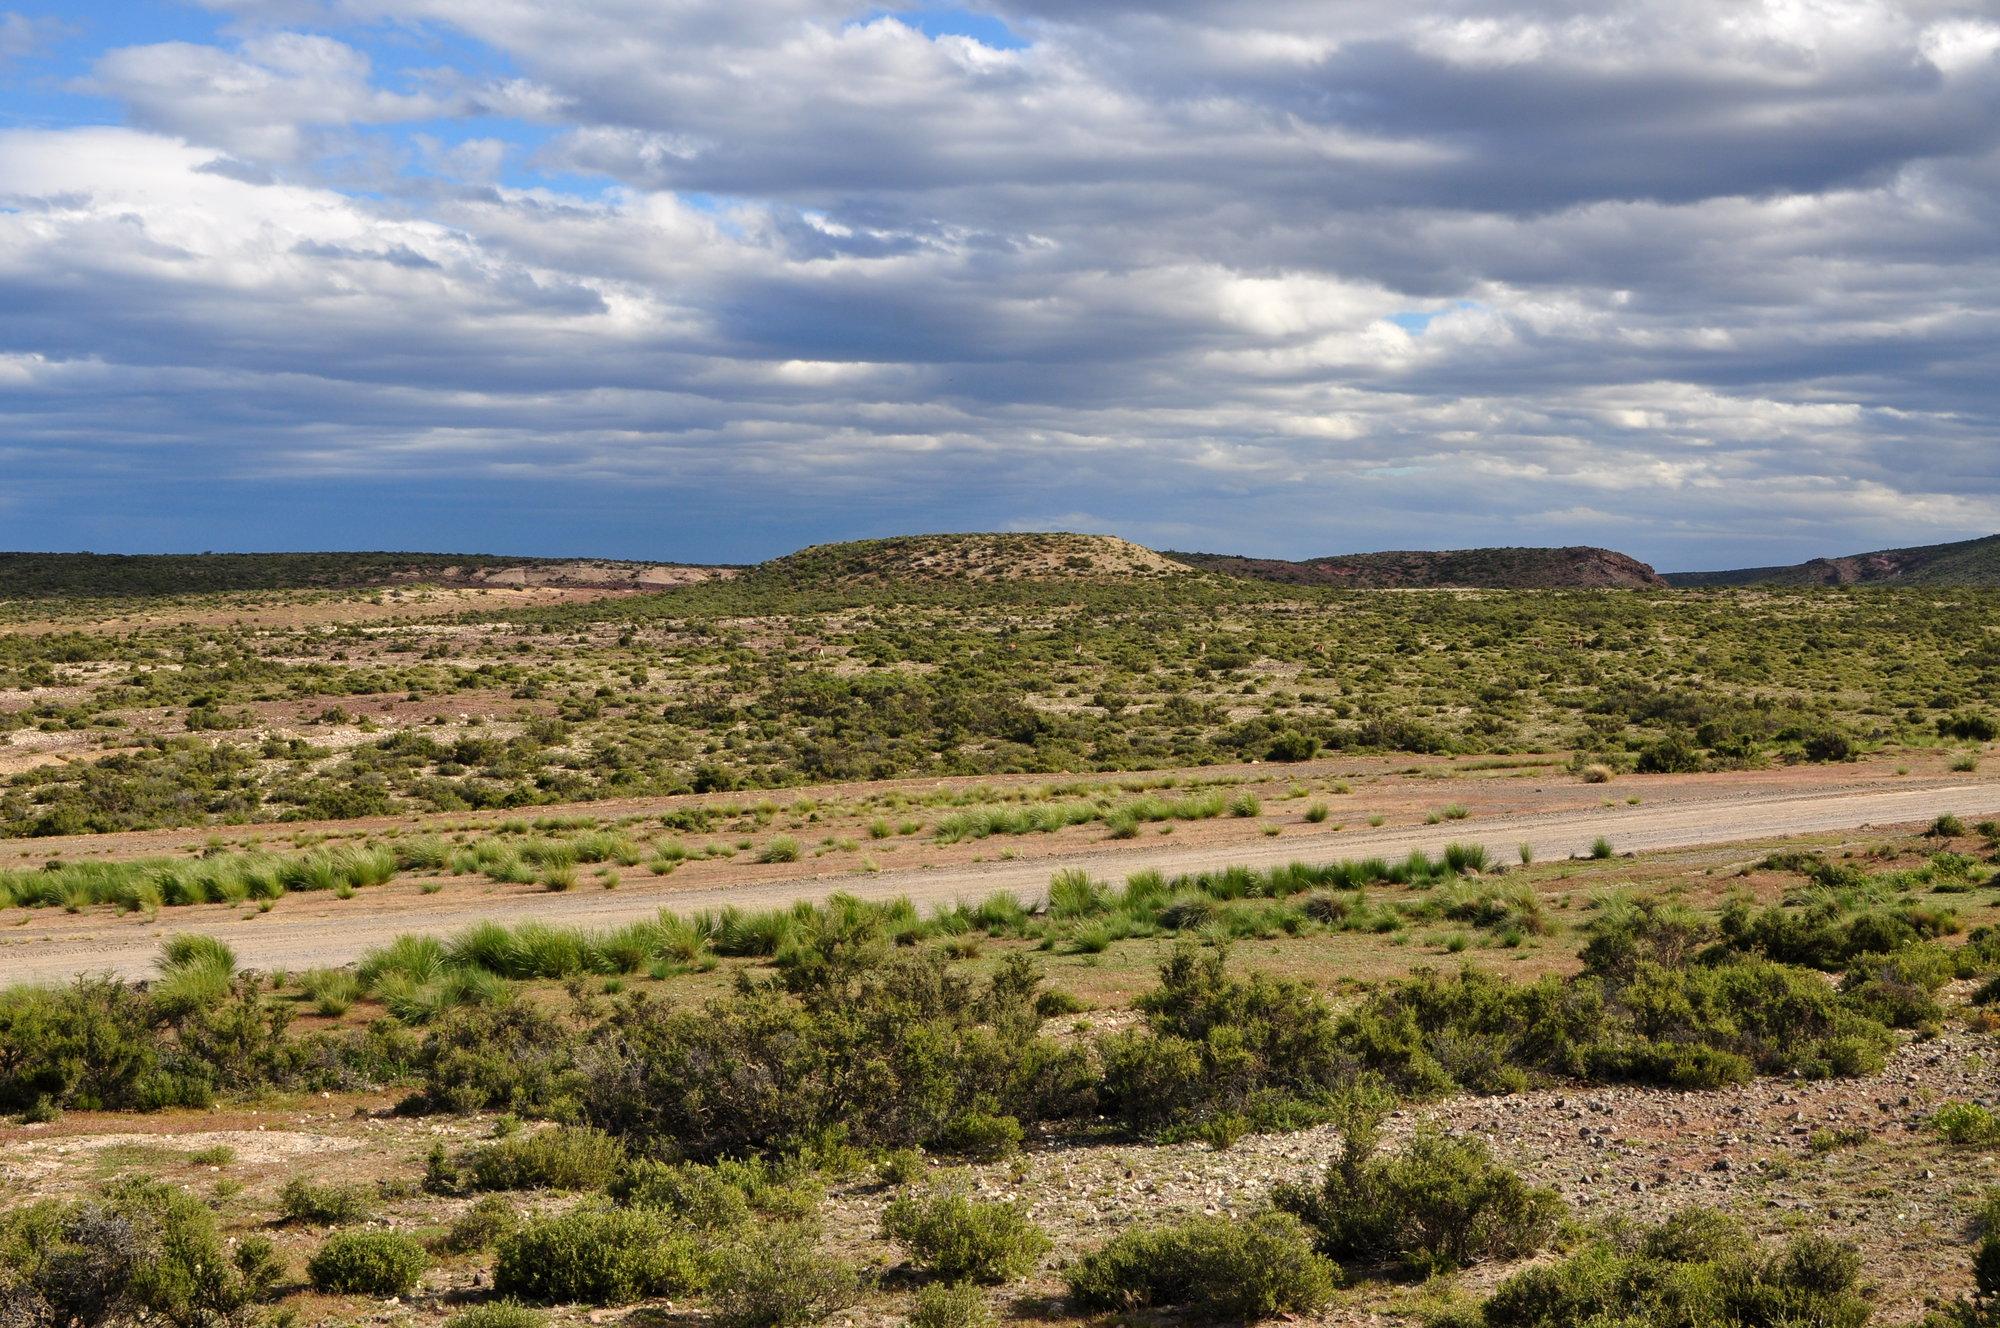 okolí Punta Tombo